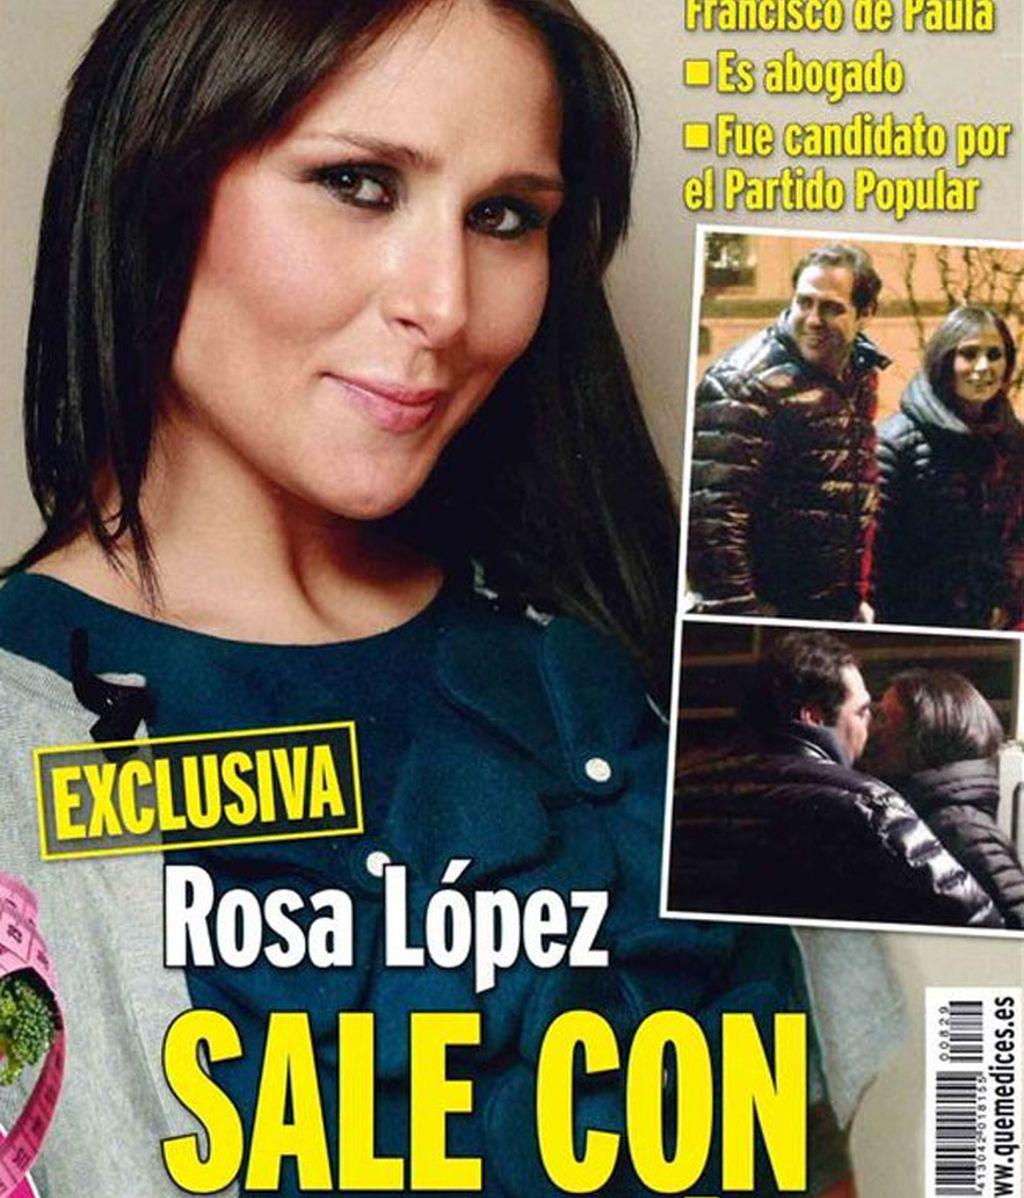 Rosa López, enamorada